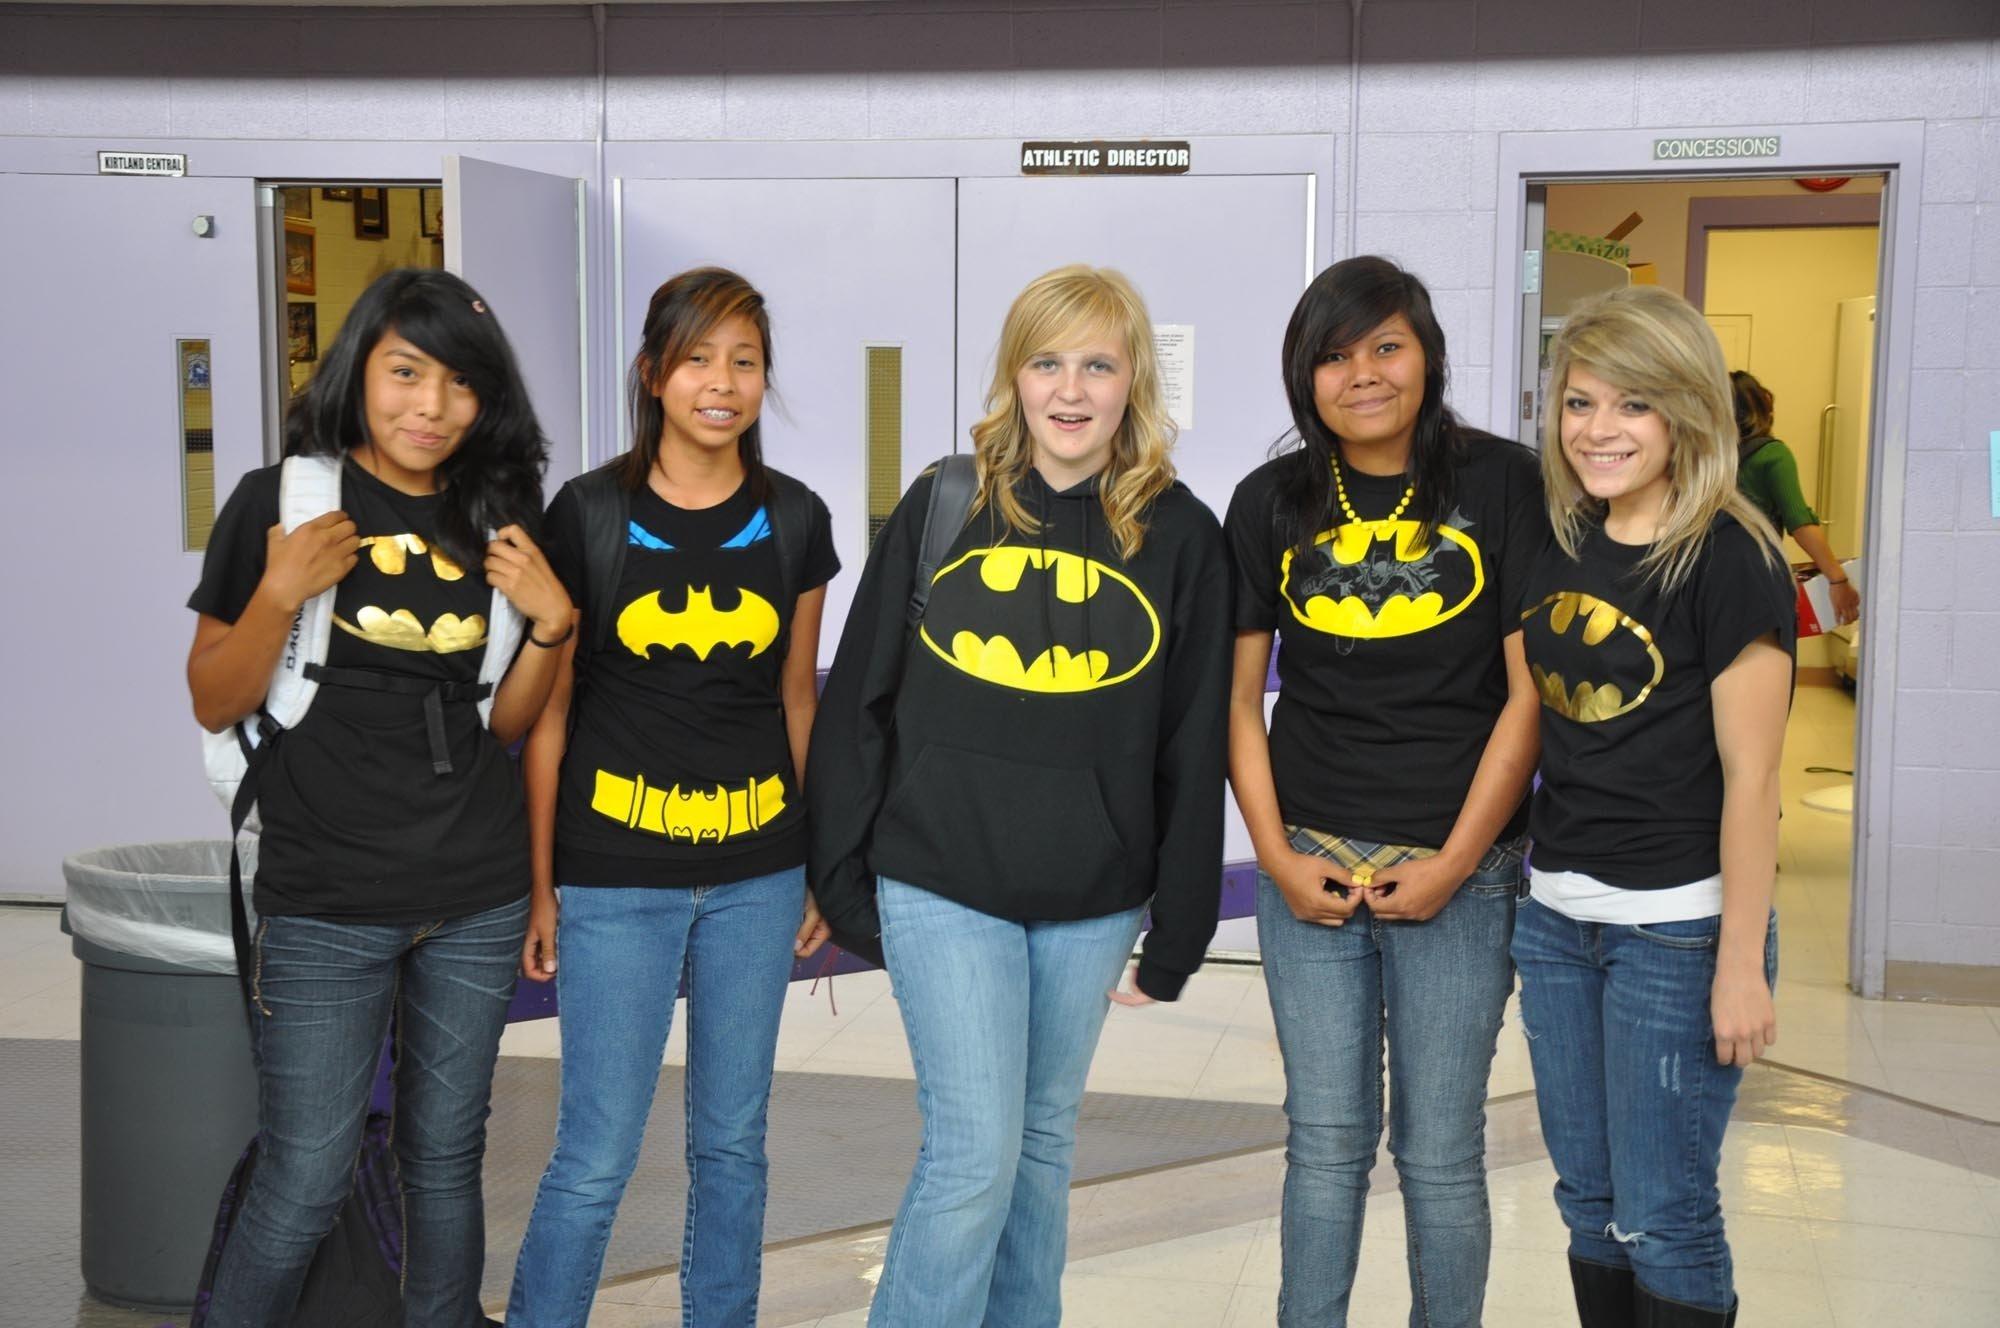 10 Cute Superhero Day Ideas At School homecoming 2010 2021